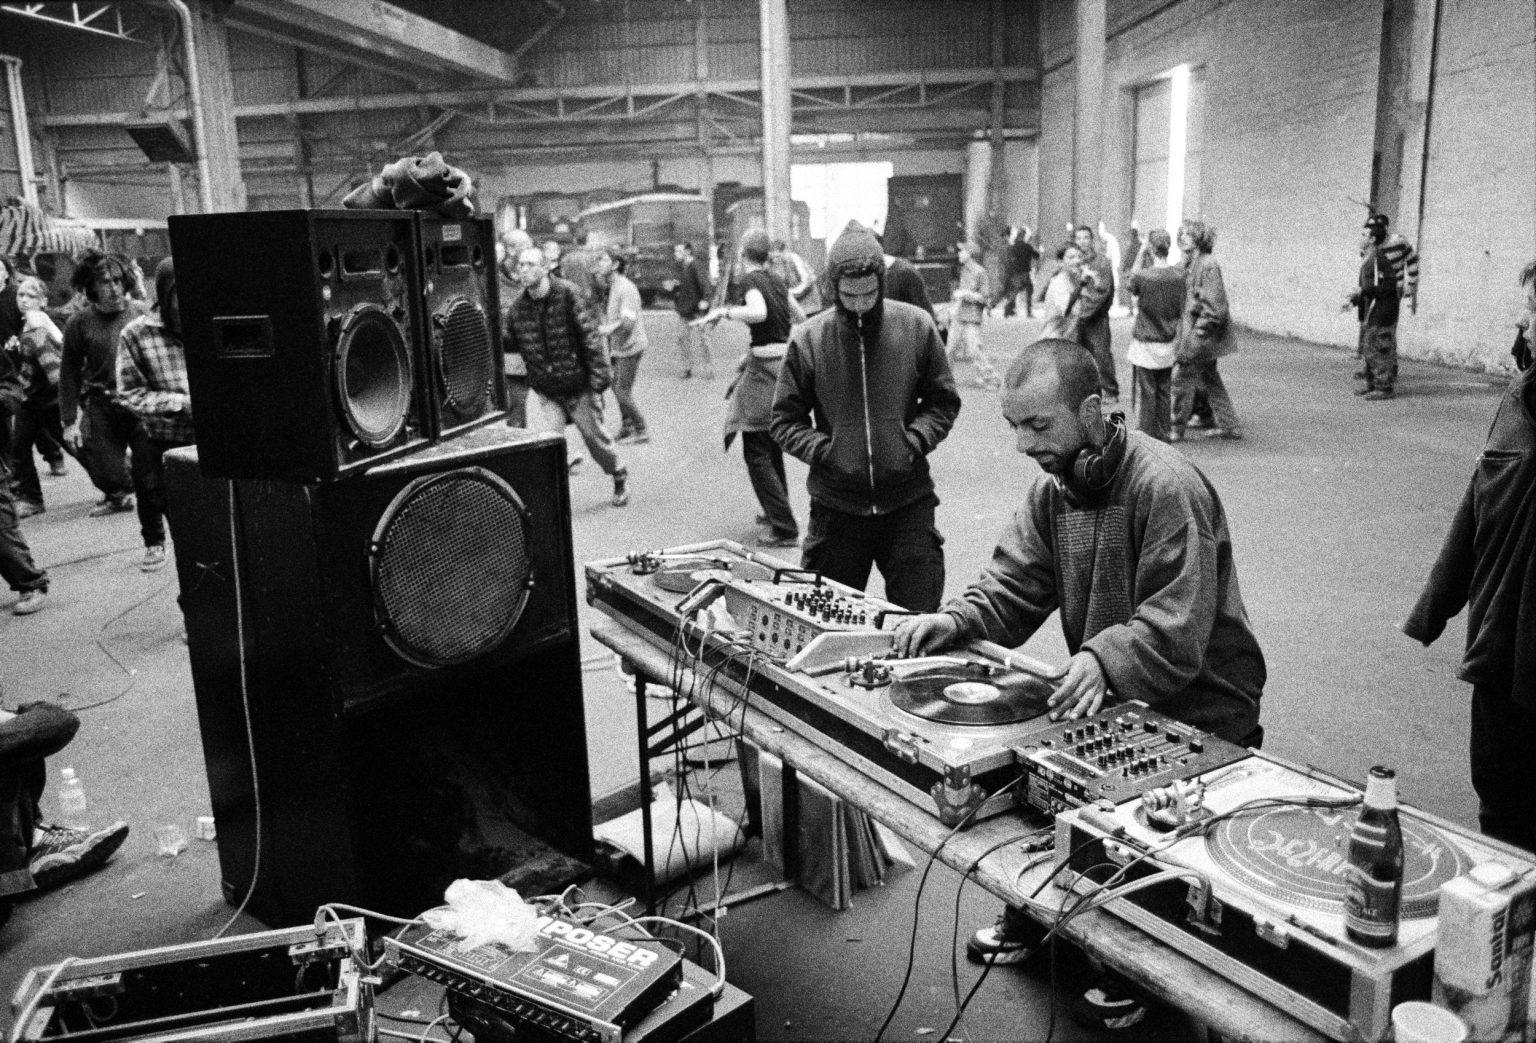 Bologna, 1998 - Bologna Squat Party. >< Bologna, 1998 - Squat Party.